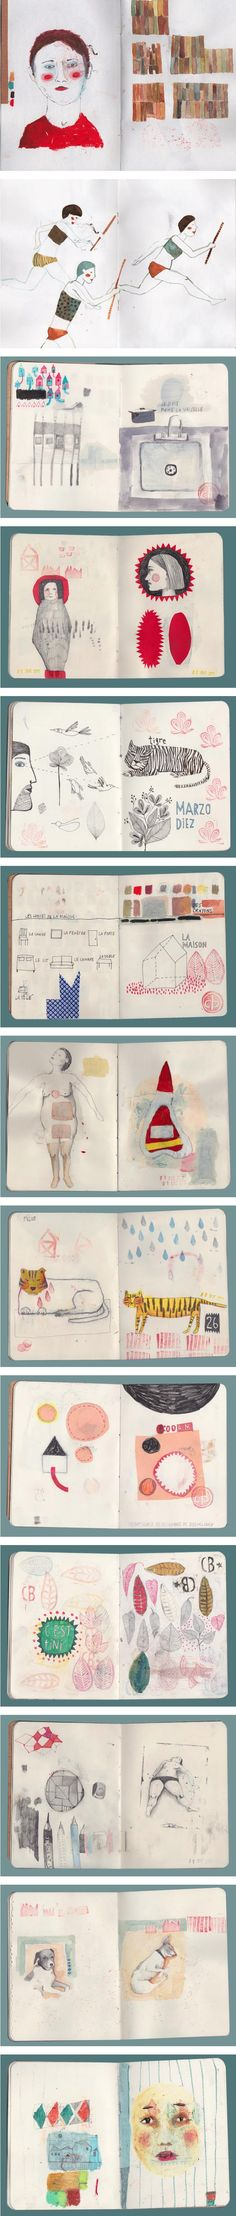 The beautiful sketchbook of Carolina Bernal http://madebywolf.com/blog/post/the-sketchbook-of-carolina-bernal